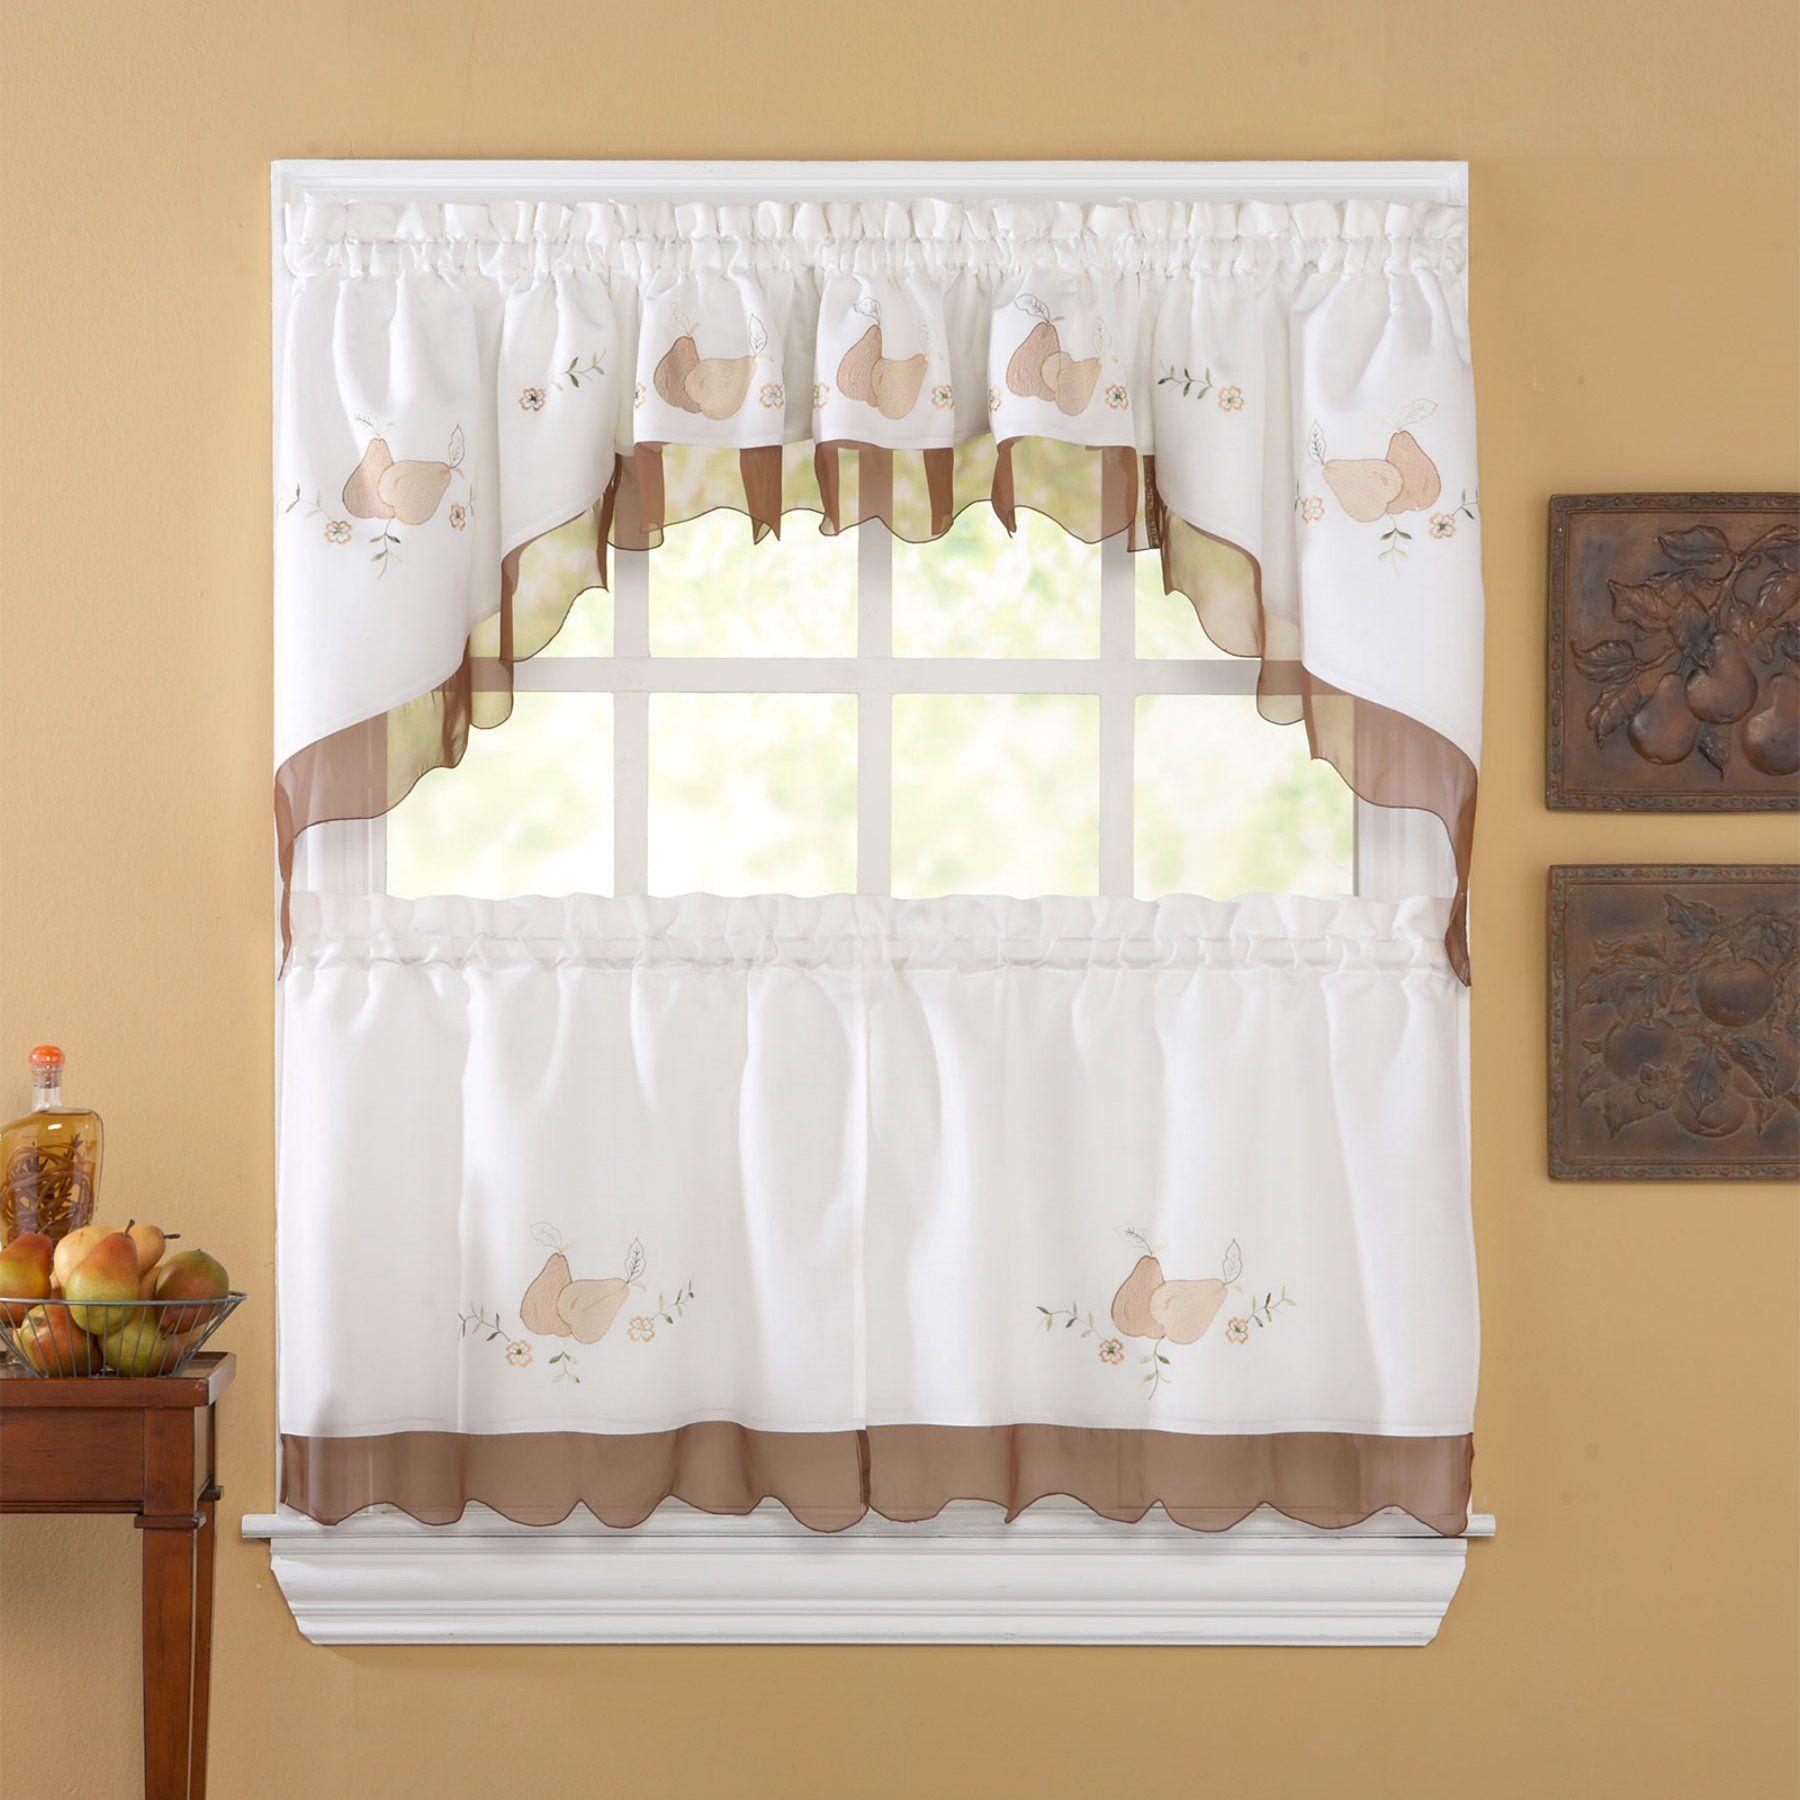 Exceptionnel CHF Anjou Pear Kitchen Curtain Set   CHFI167